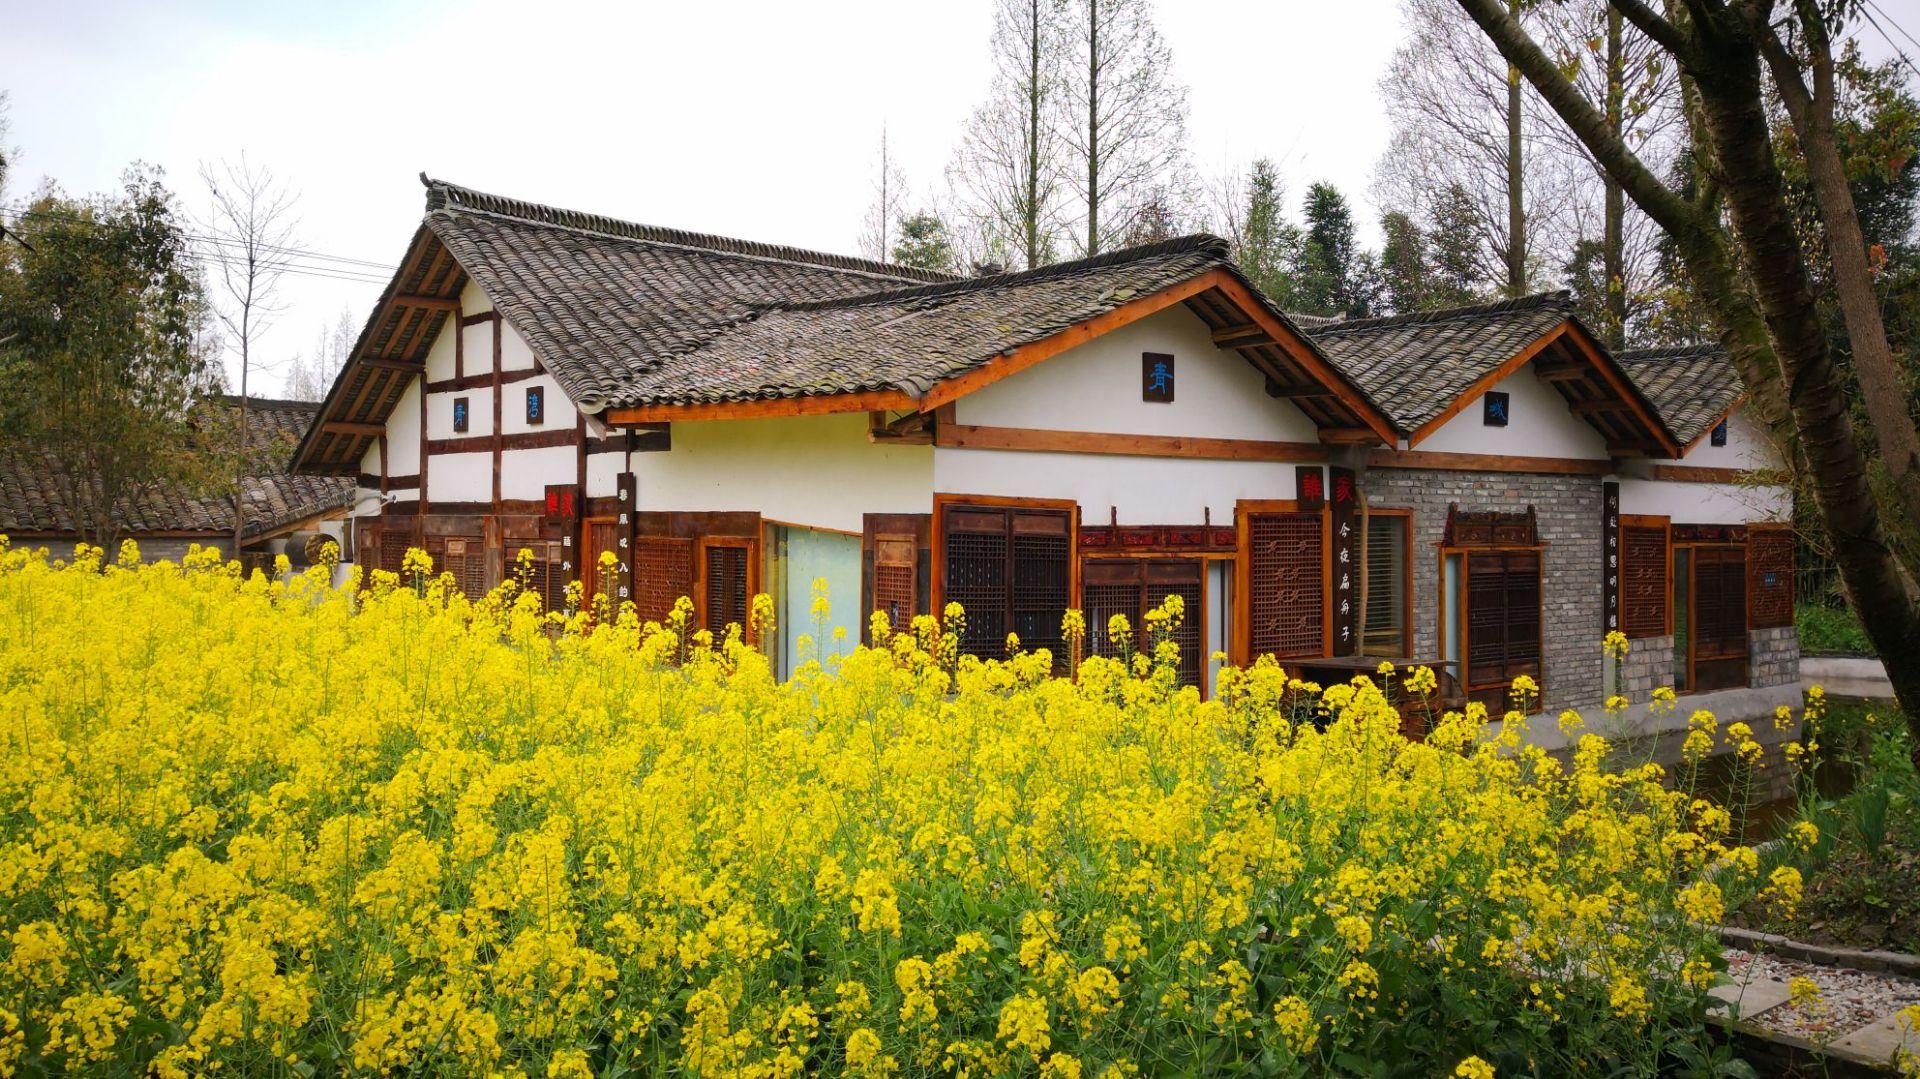 Qingchengwan Wetland Manor